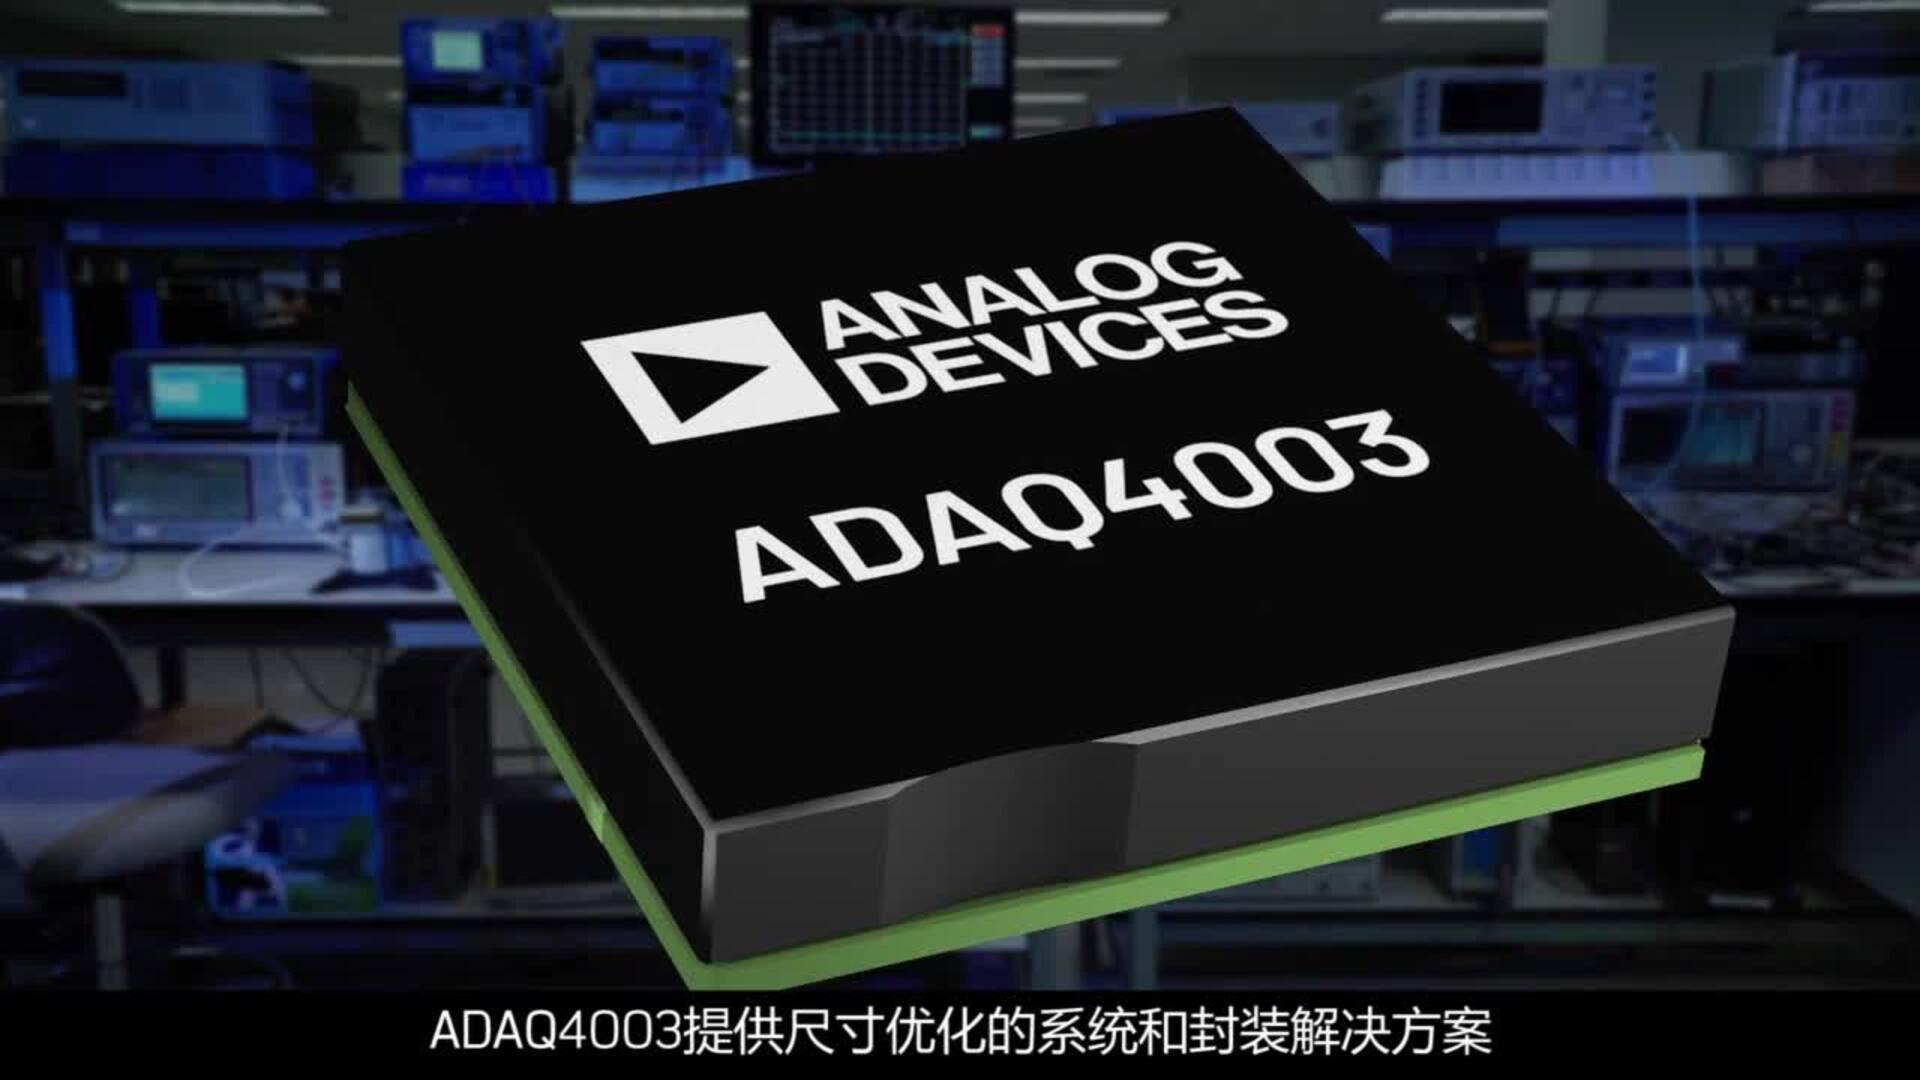 ADAQ4003:18位、2 MSPS μModule®数据采集解决方案